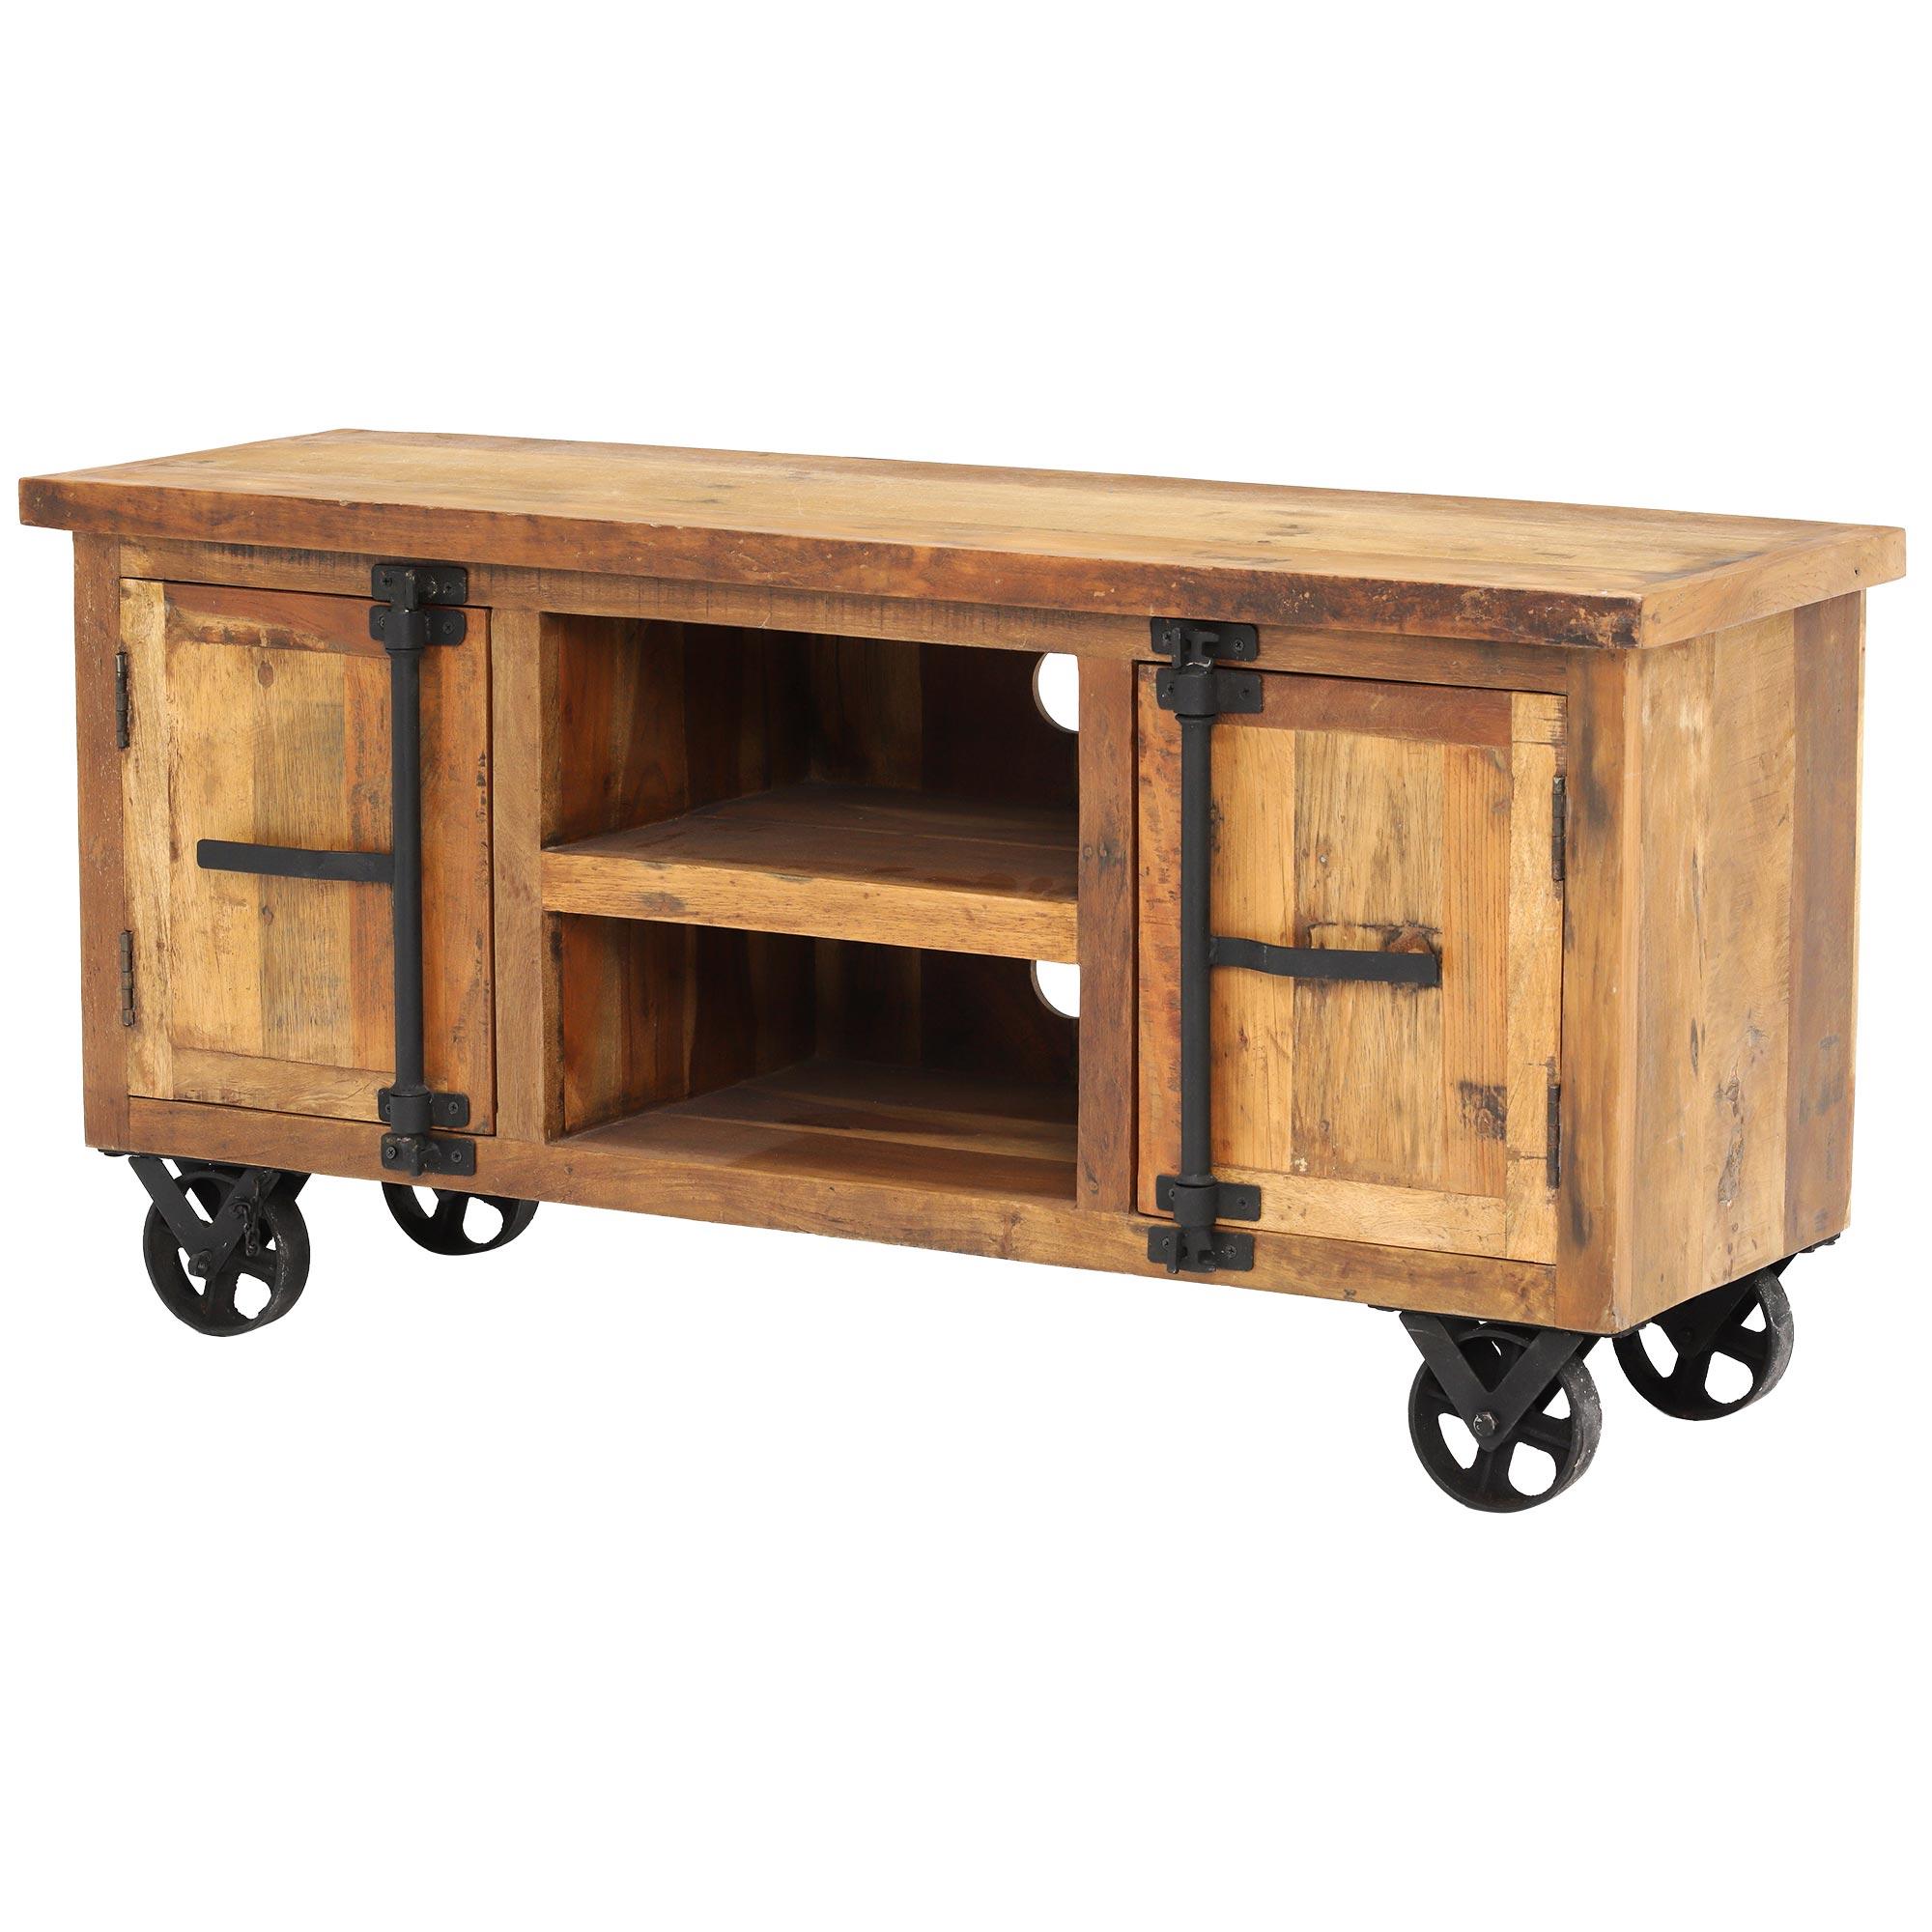 Little Tree Furniture Hyatt Reclaimed Wood Tv Unit On Wheels (View 9 of 20)